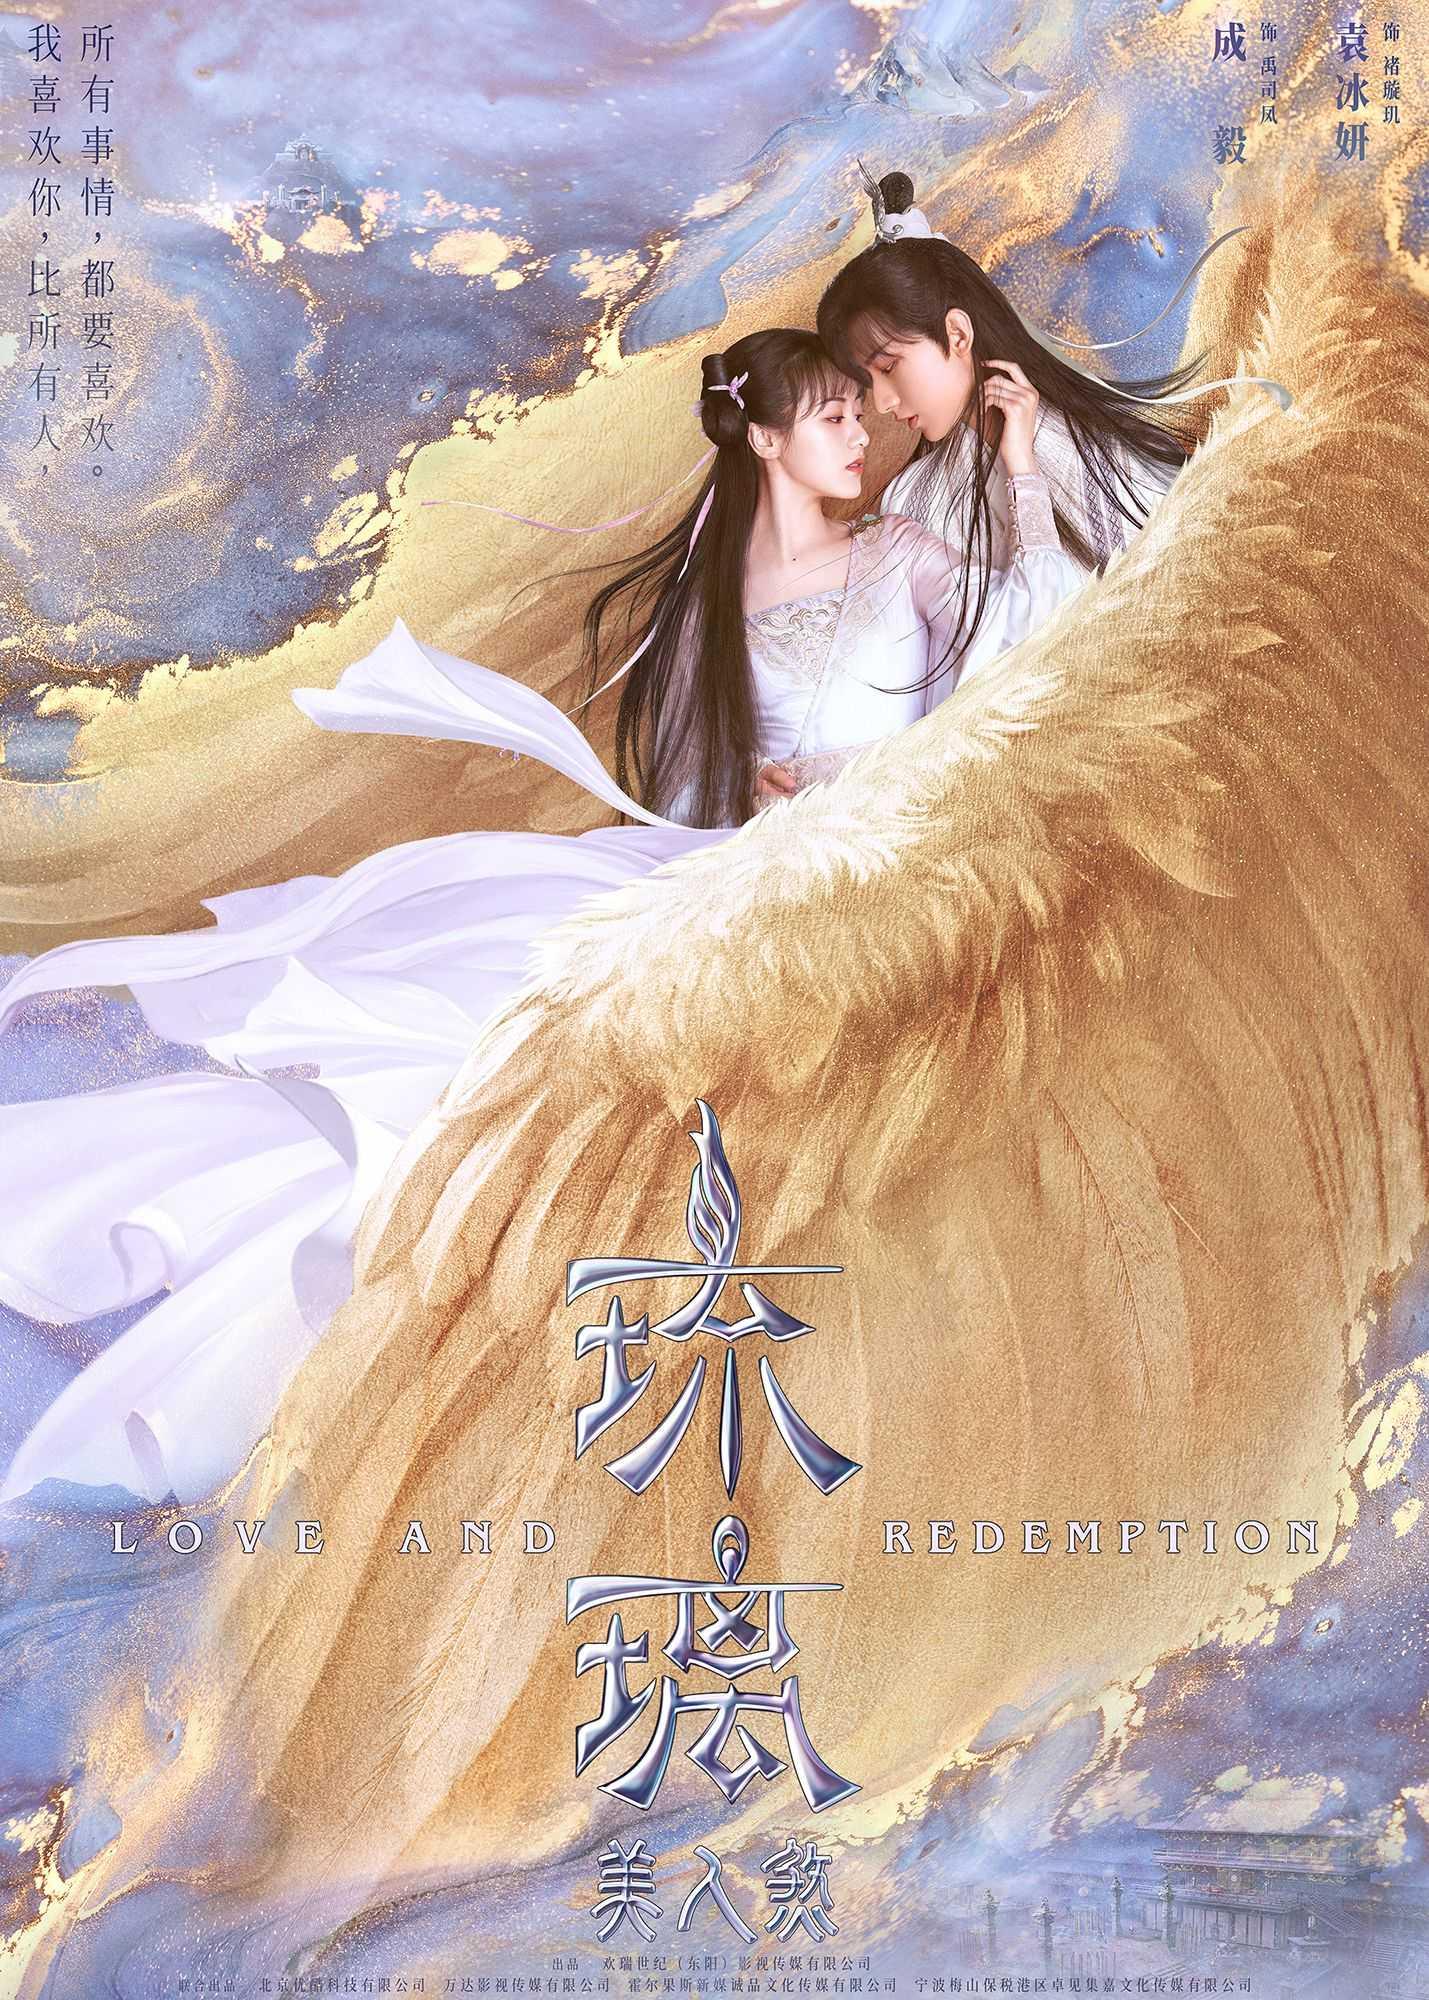 love-and-redemption-ปลดผนึกหัวใจ-2020-ตอนที่-1-59-พากย์ไทย-จบ-